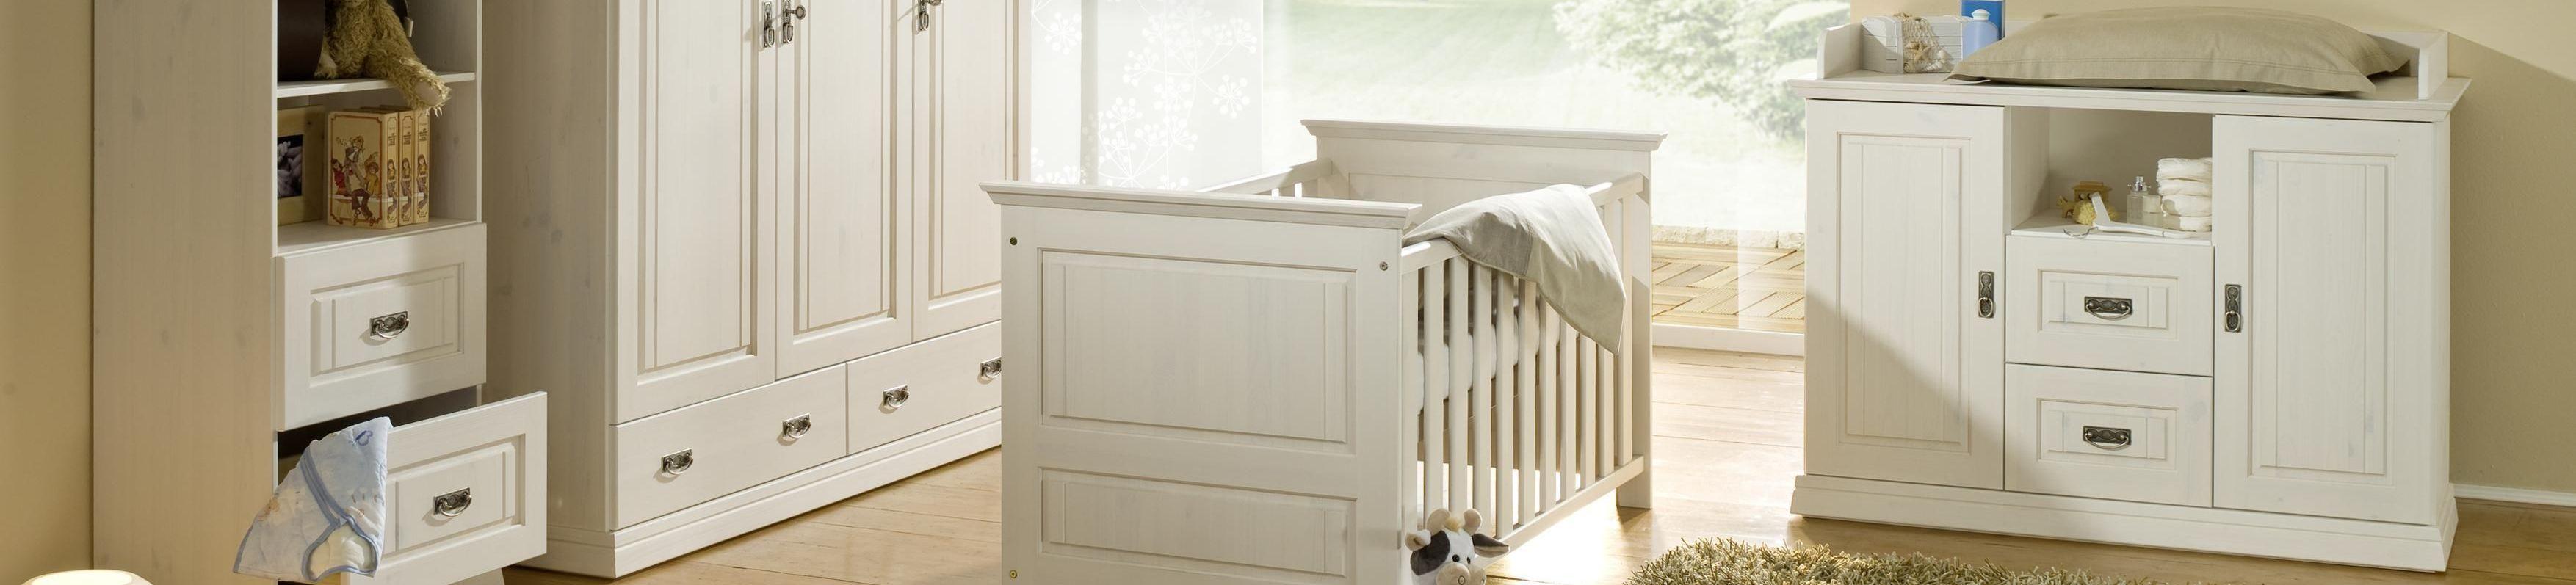 13 schrank fr telefon schmal holz kernbuche buche massiv gelt 1 trig klein jale eckbank. Black Bedroom Furniture Sets. Home Design Ideas